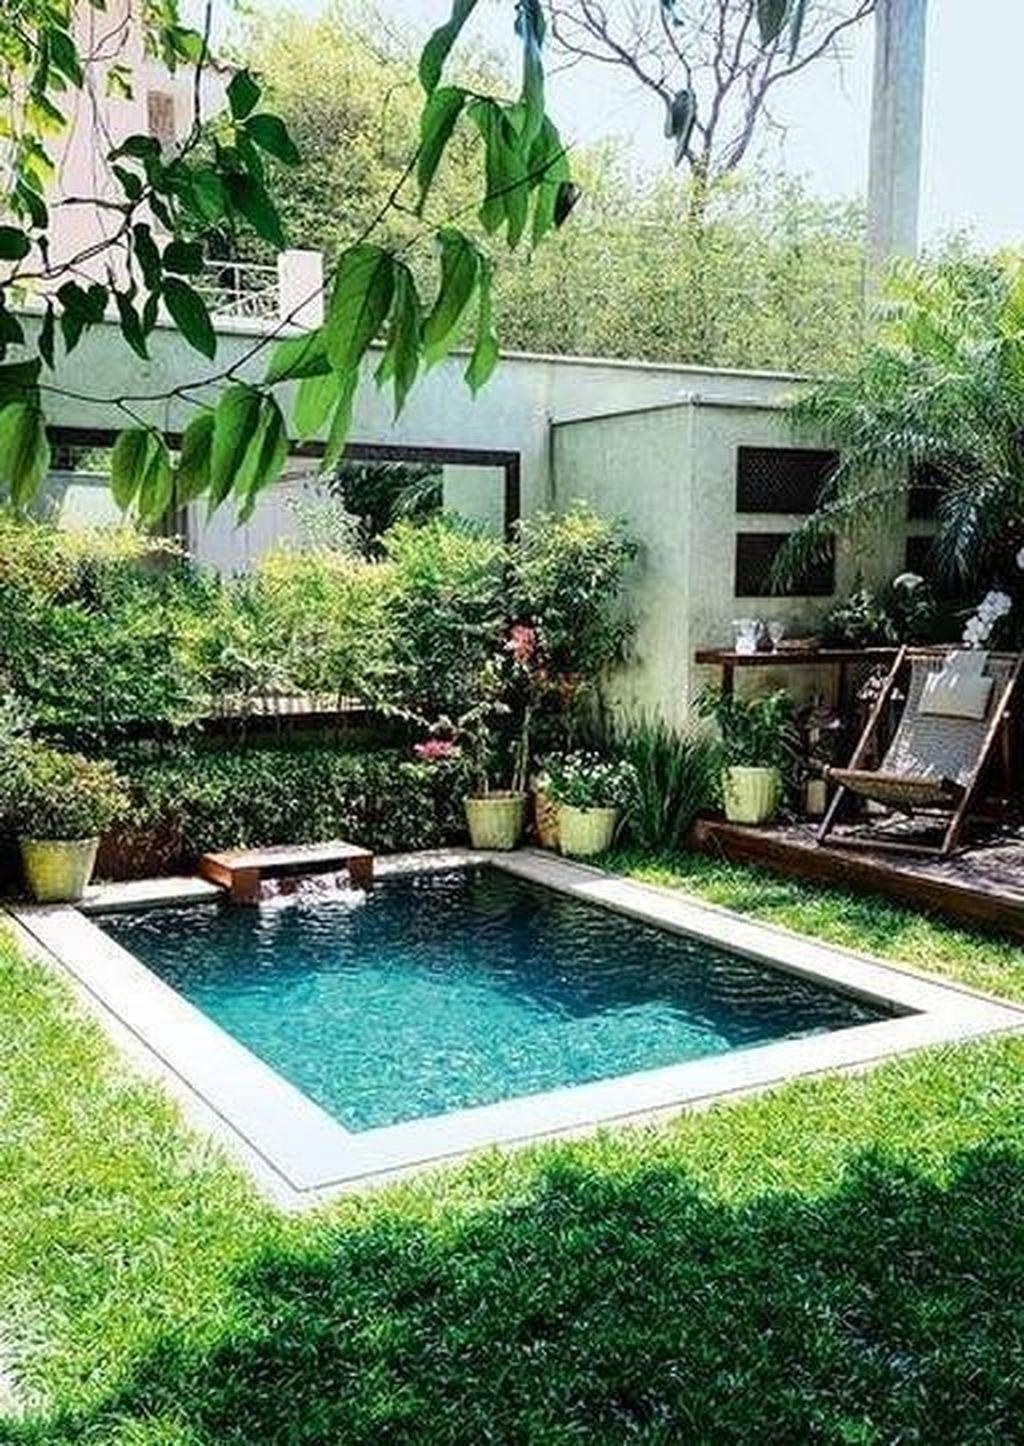 30 Amazing Natural Small Pools Design Ideas For Backyard Coodecor Small Pool Design Small Inground Pool Swimming Pools Backyard